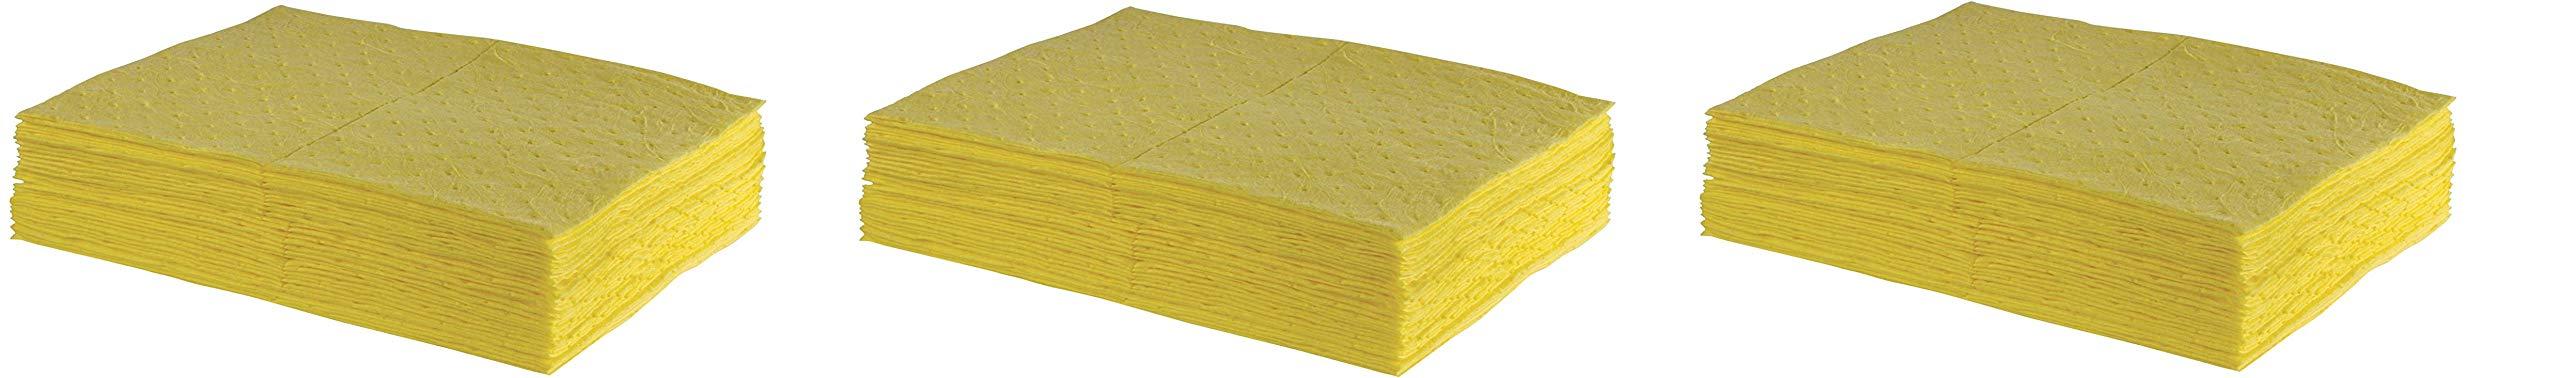 ESP 2MBYPB Polypropylene Medium Weight Meltblown Absorbent Sonic Bonded Hazmat Pad, 20 Gallons Oil and 13 Gallons Water Absorbency, 18'' Length X 15'' Width, Yellow (100 per Bale) (3 X 100 per Bale)